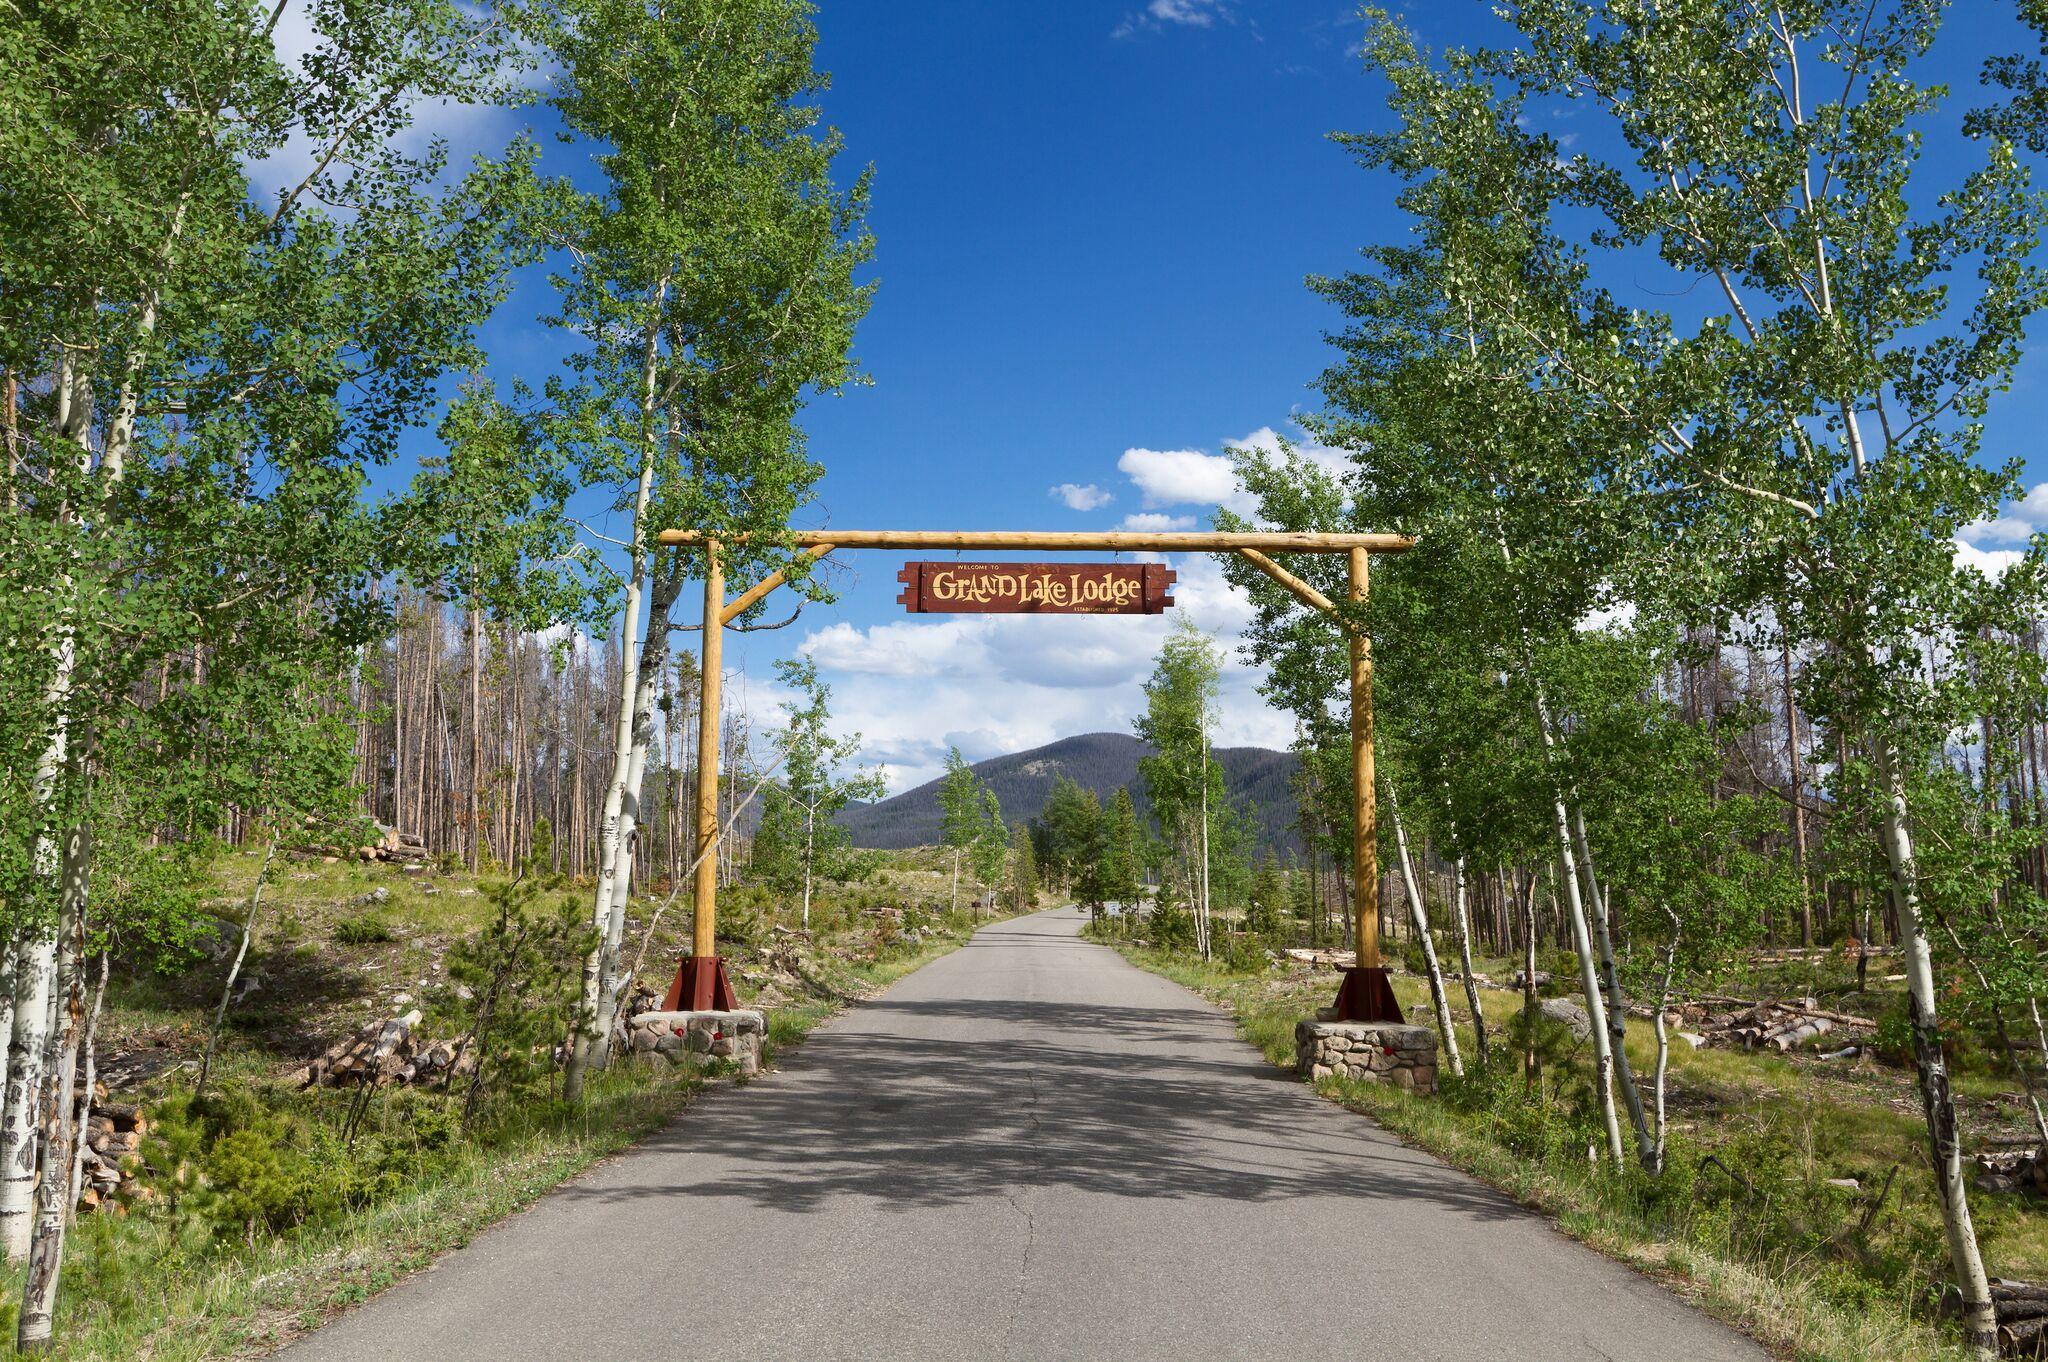 Grand Lake Lodge image 1